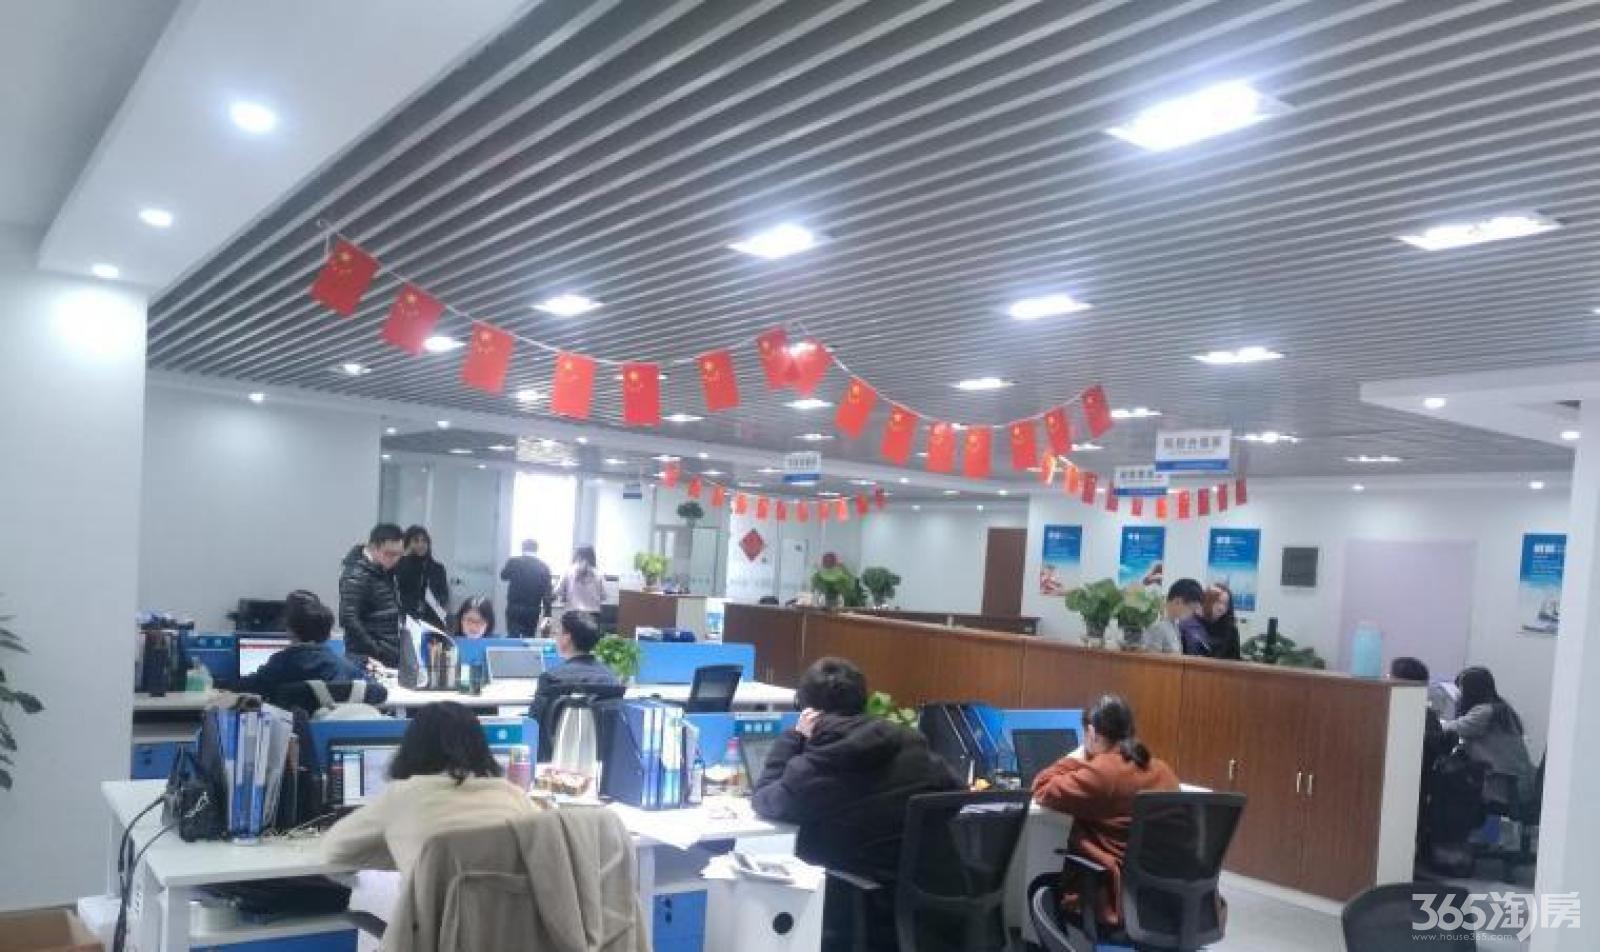 5a5a5a_河西万达广场中央商务区临近地铁口写字楼级别5a5a5a